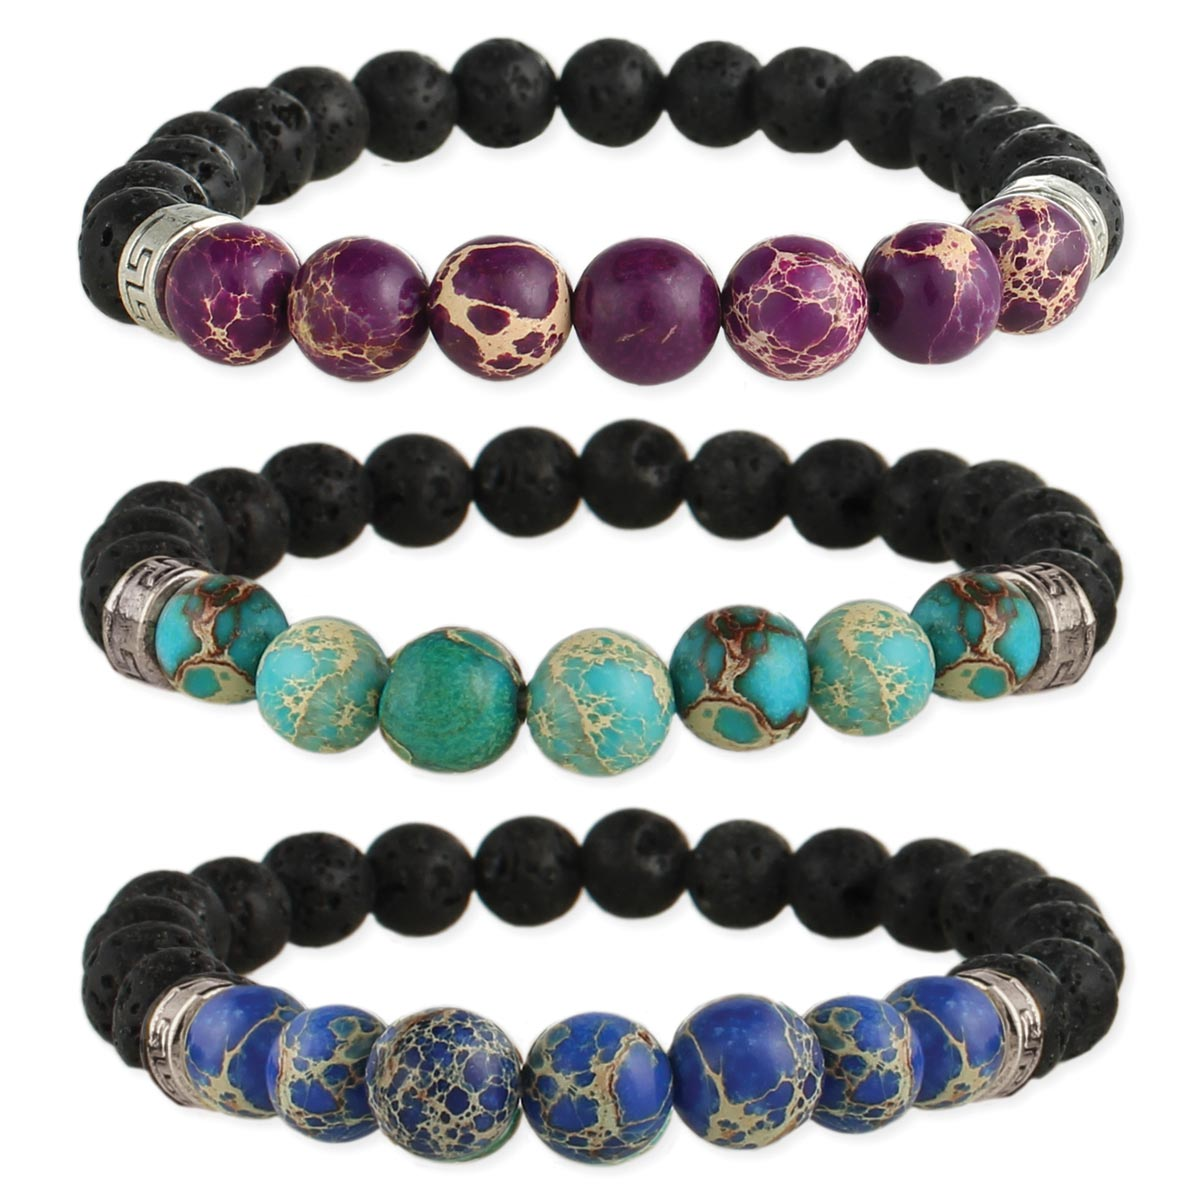 Stone Lava Bead Diffuser Stretch Bracelet